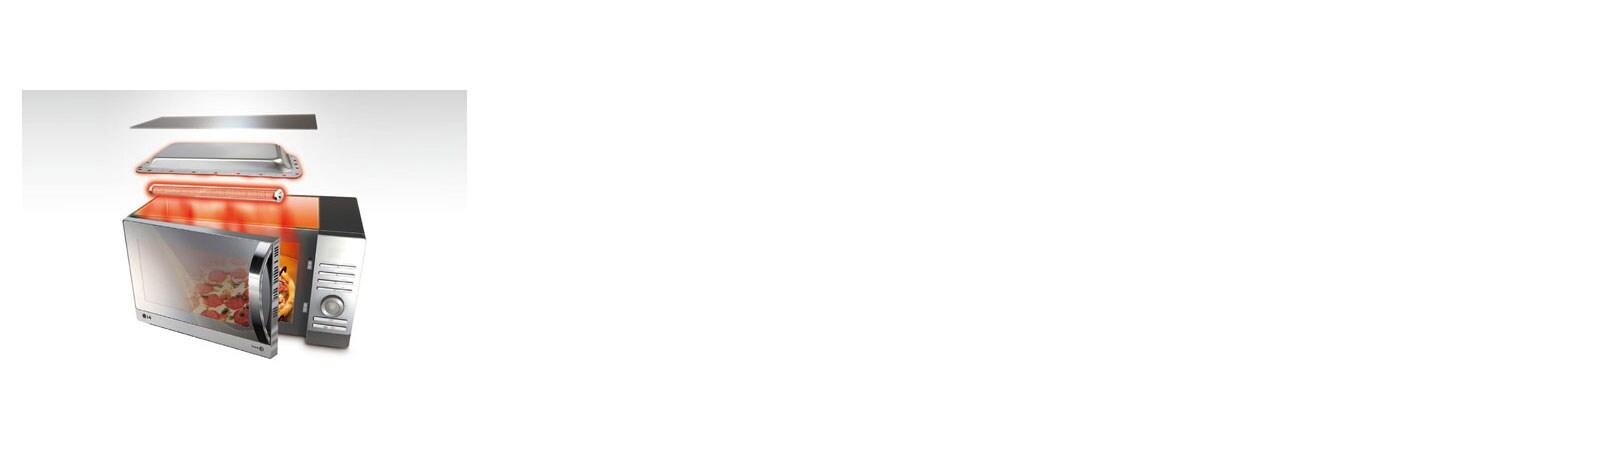 MH6044DB_Quartz-Heater_30012019_D_v